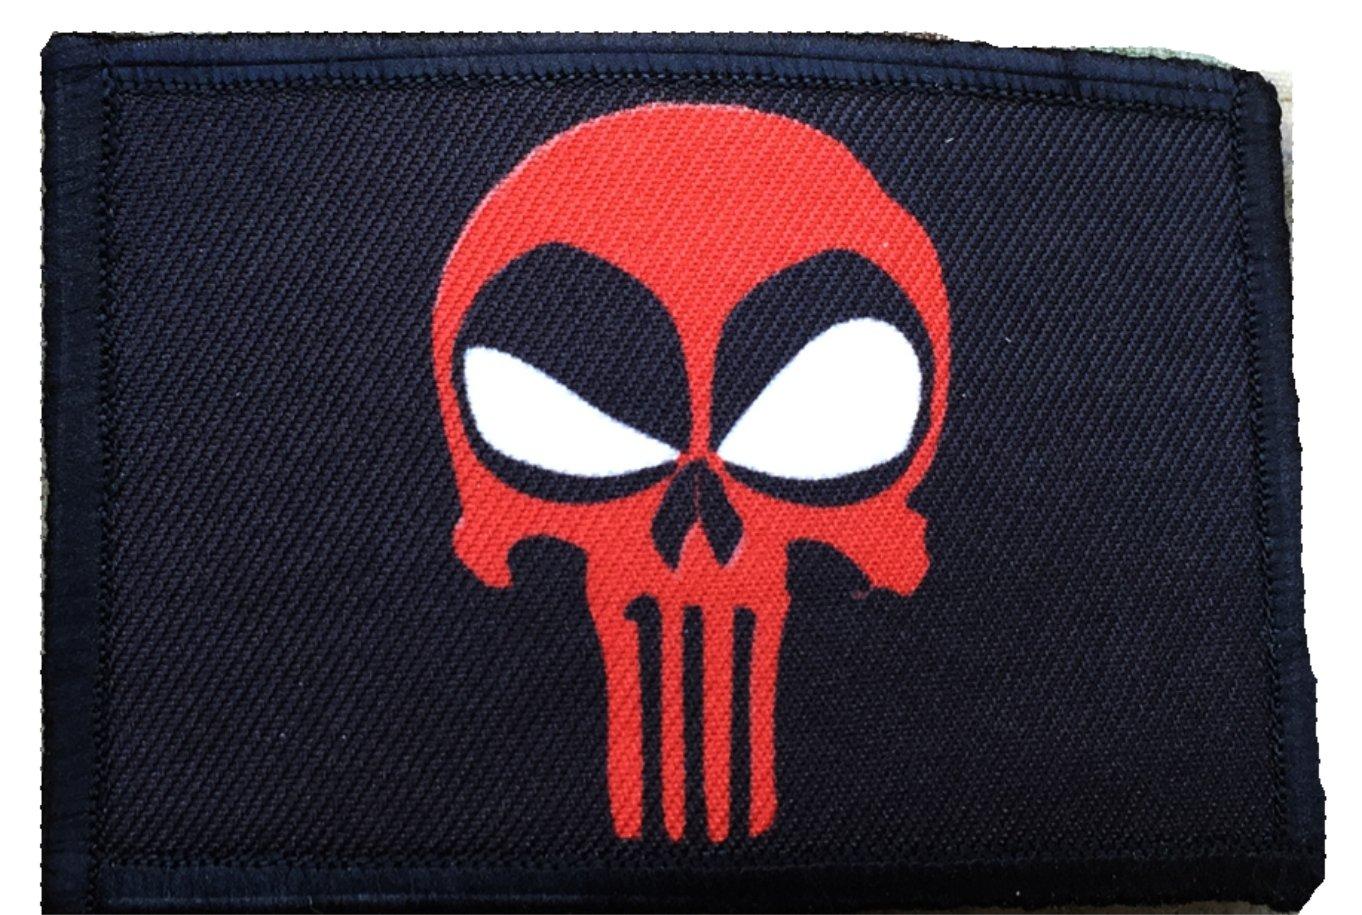 Deadpool Punisher Morale Patch. Perfecto para tu equipo táctico militar, mochila, gorra de béisbol del operador, portador de platos o chaleco.